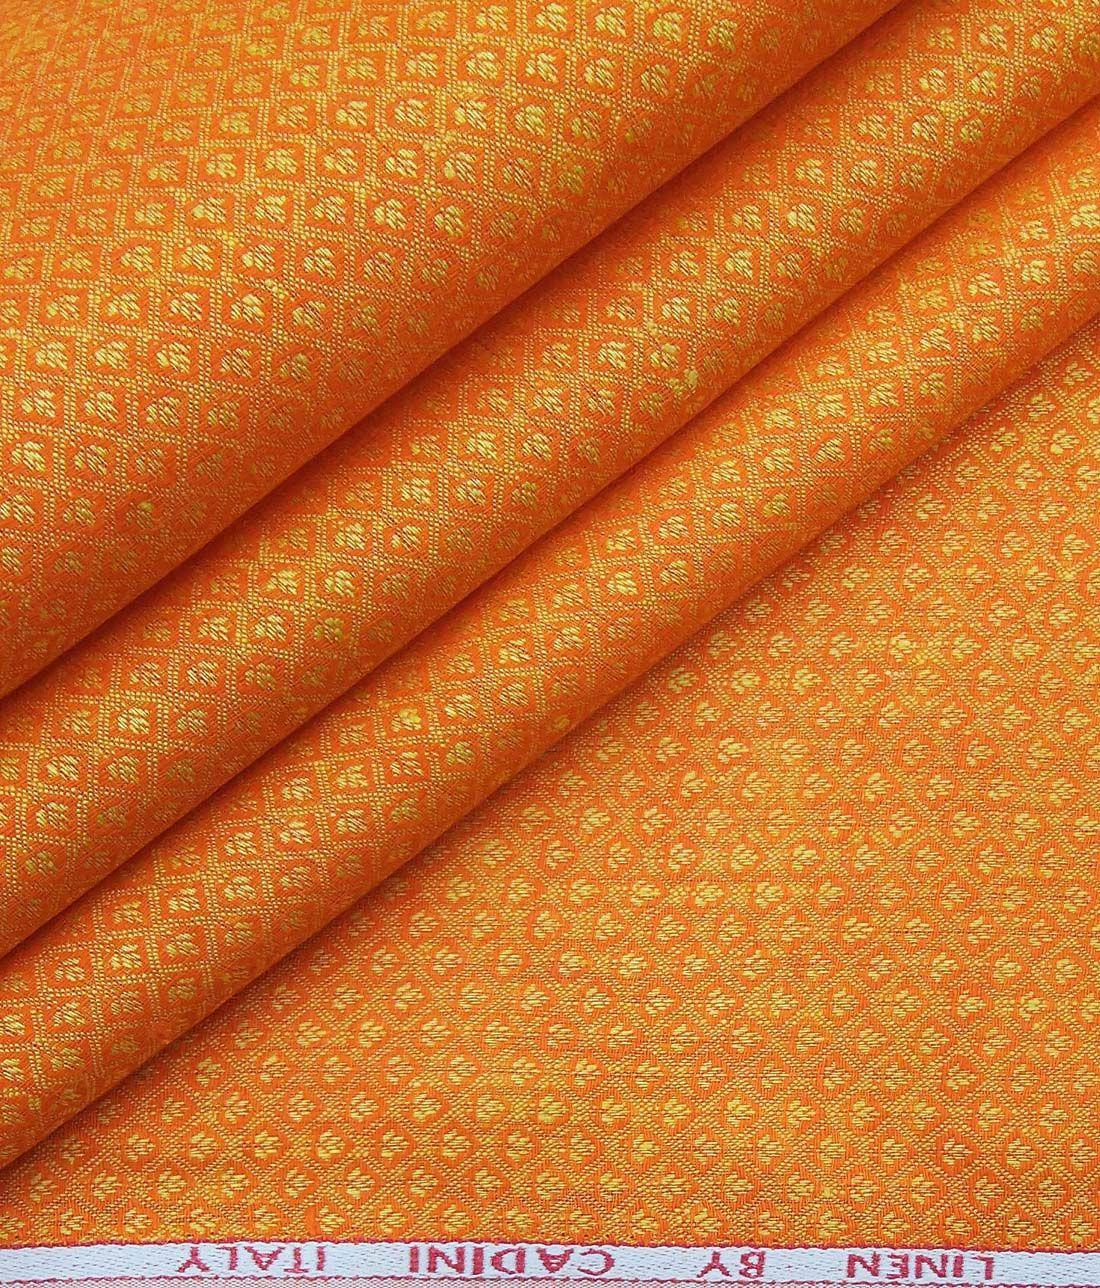 Cadini Italy Orange 100 European Linen 60 Lea Floral Jacquard Shirt Fabric 1 60 M European Linens Jacquard Shirt Fabric